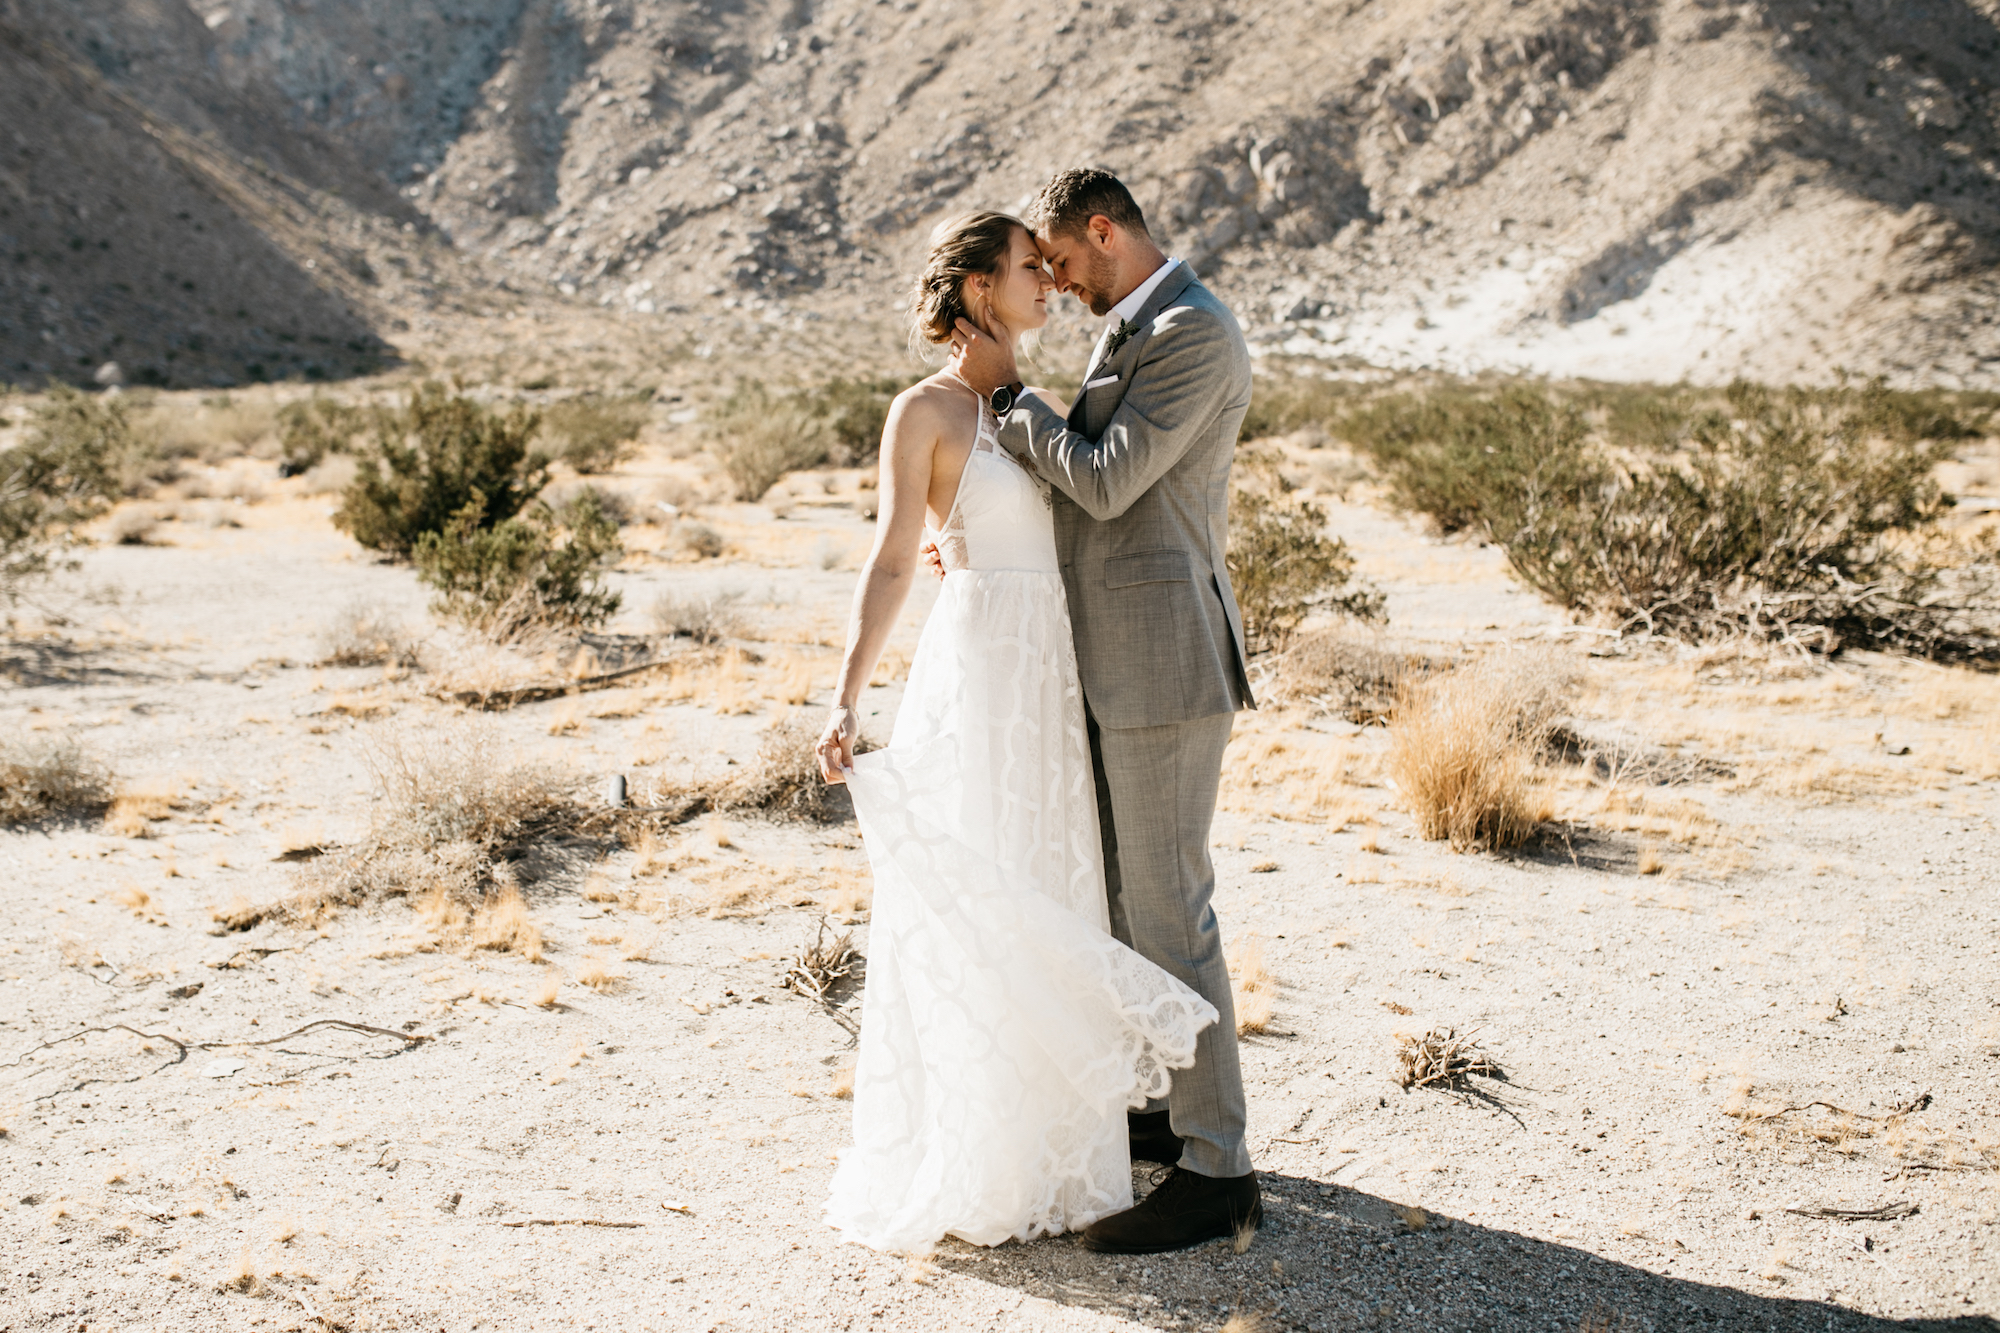 ace-hotel-palm-springs-wedding-photographer266.jpg